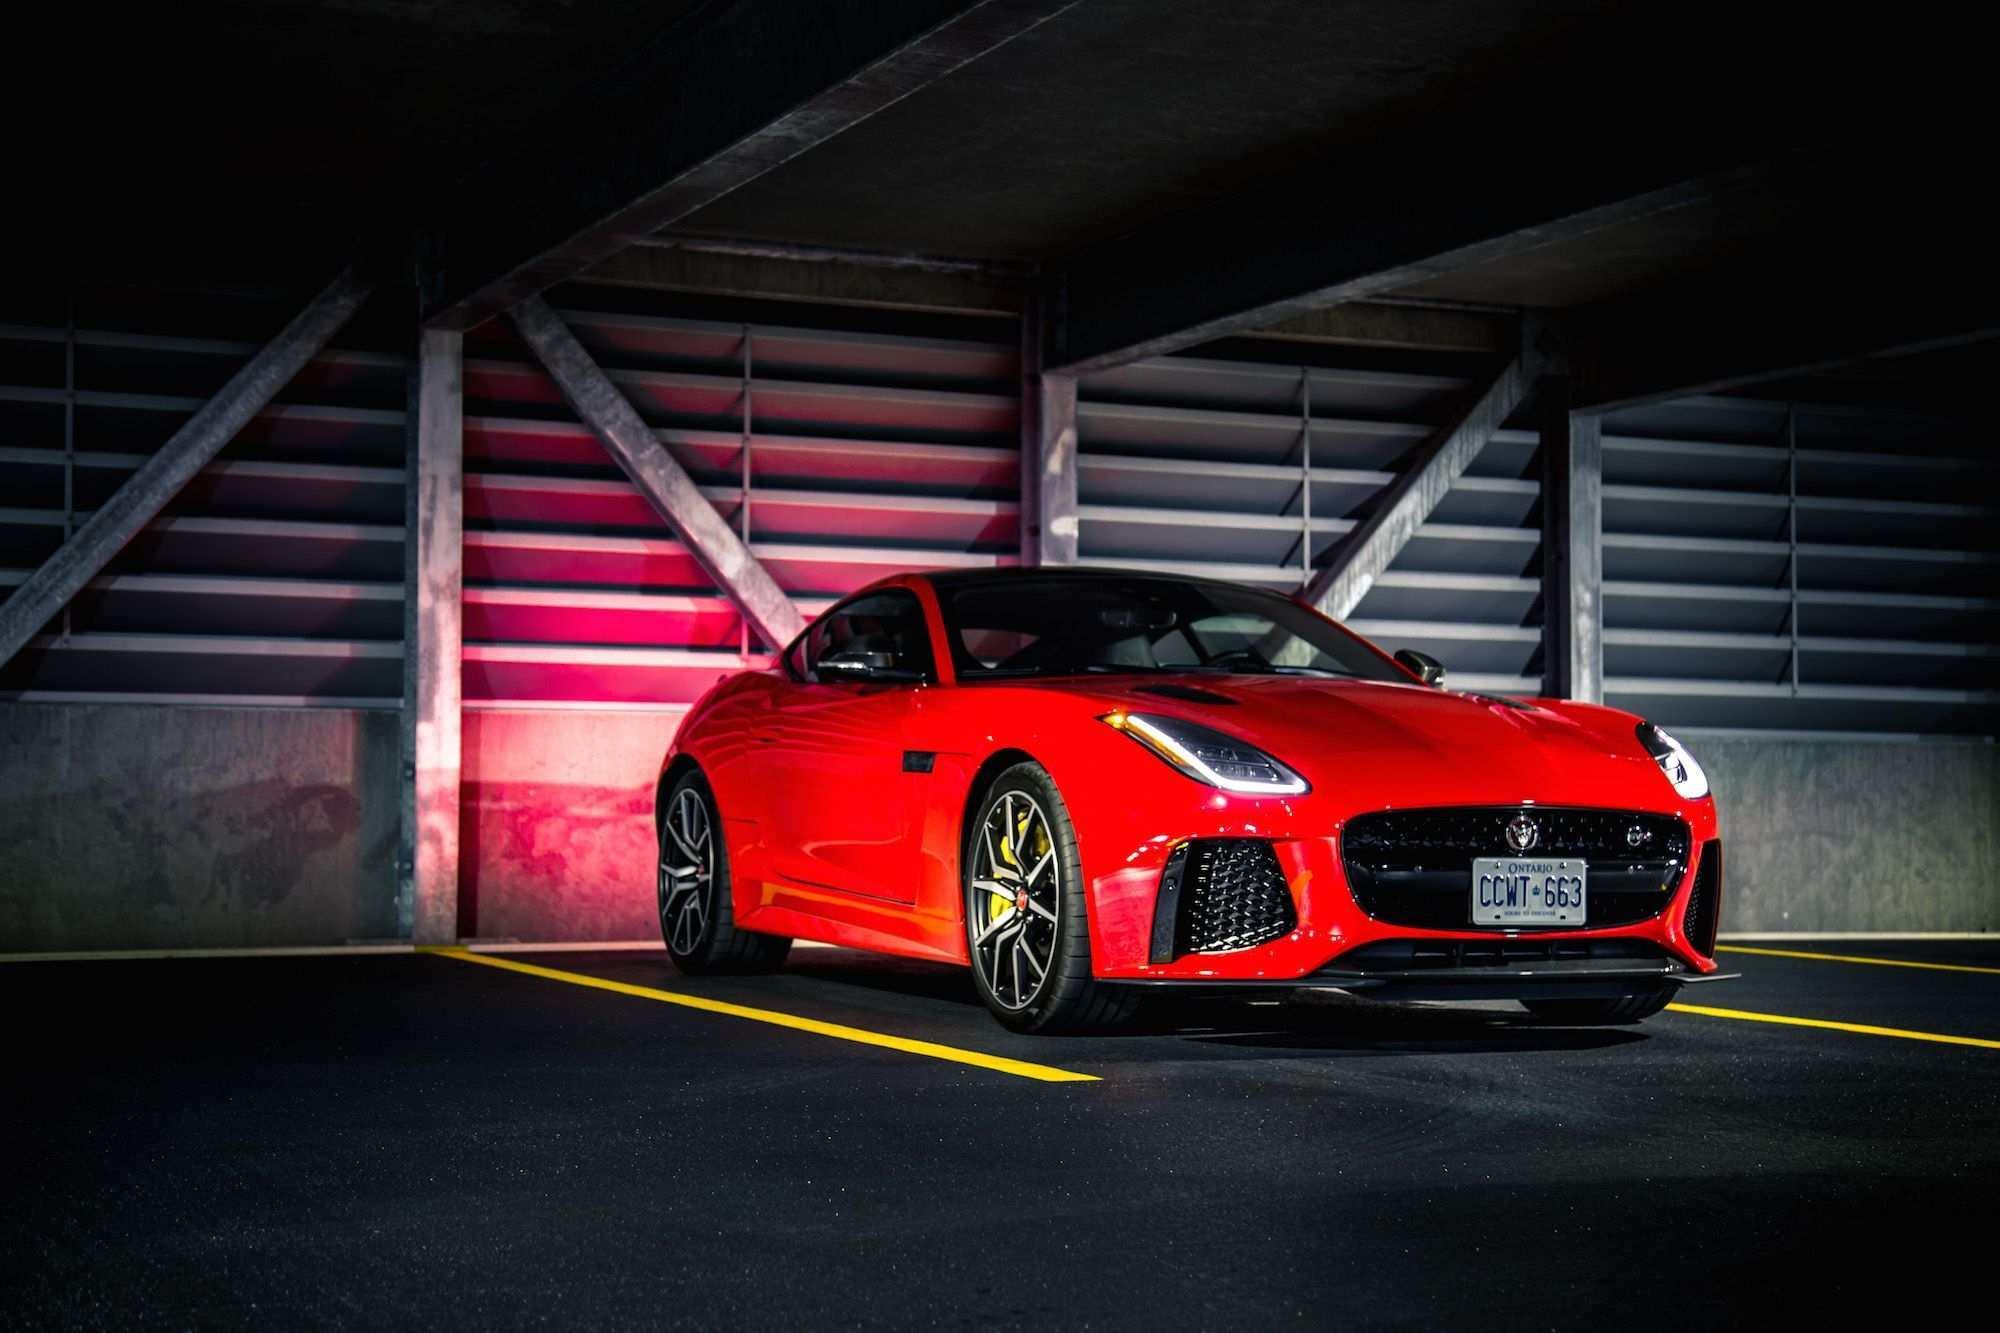 87 Great Best 2019 Jaguar F Type Release Date Review And Release Date Price and Review for Best 2019 Jaguar F Type Release Date Review And Release Date